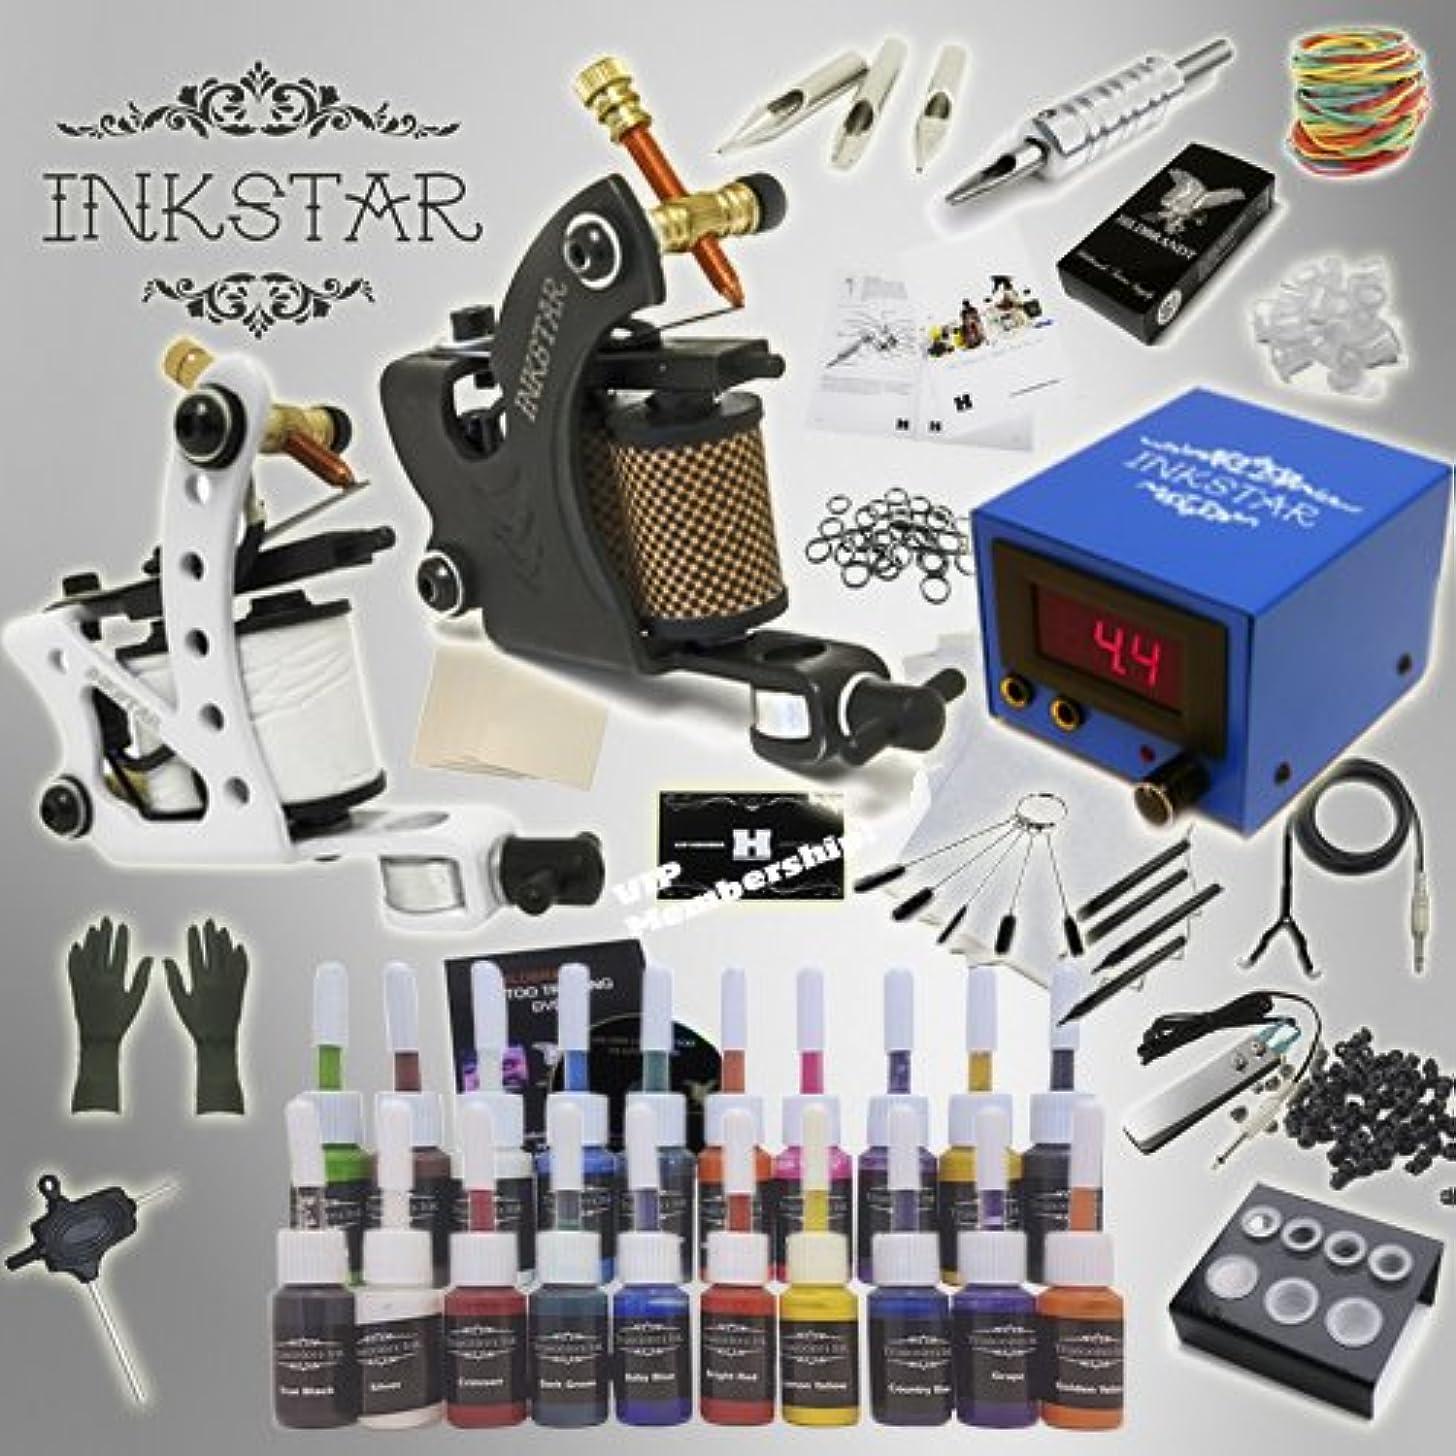 Complete Tattoo Kit Inkstar Journeyman C Machine Gun Power Supply 20 Truecolor Starter Ink Set